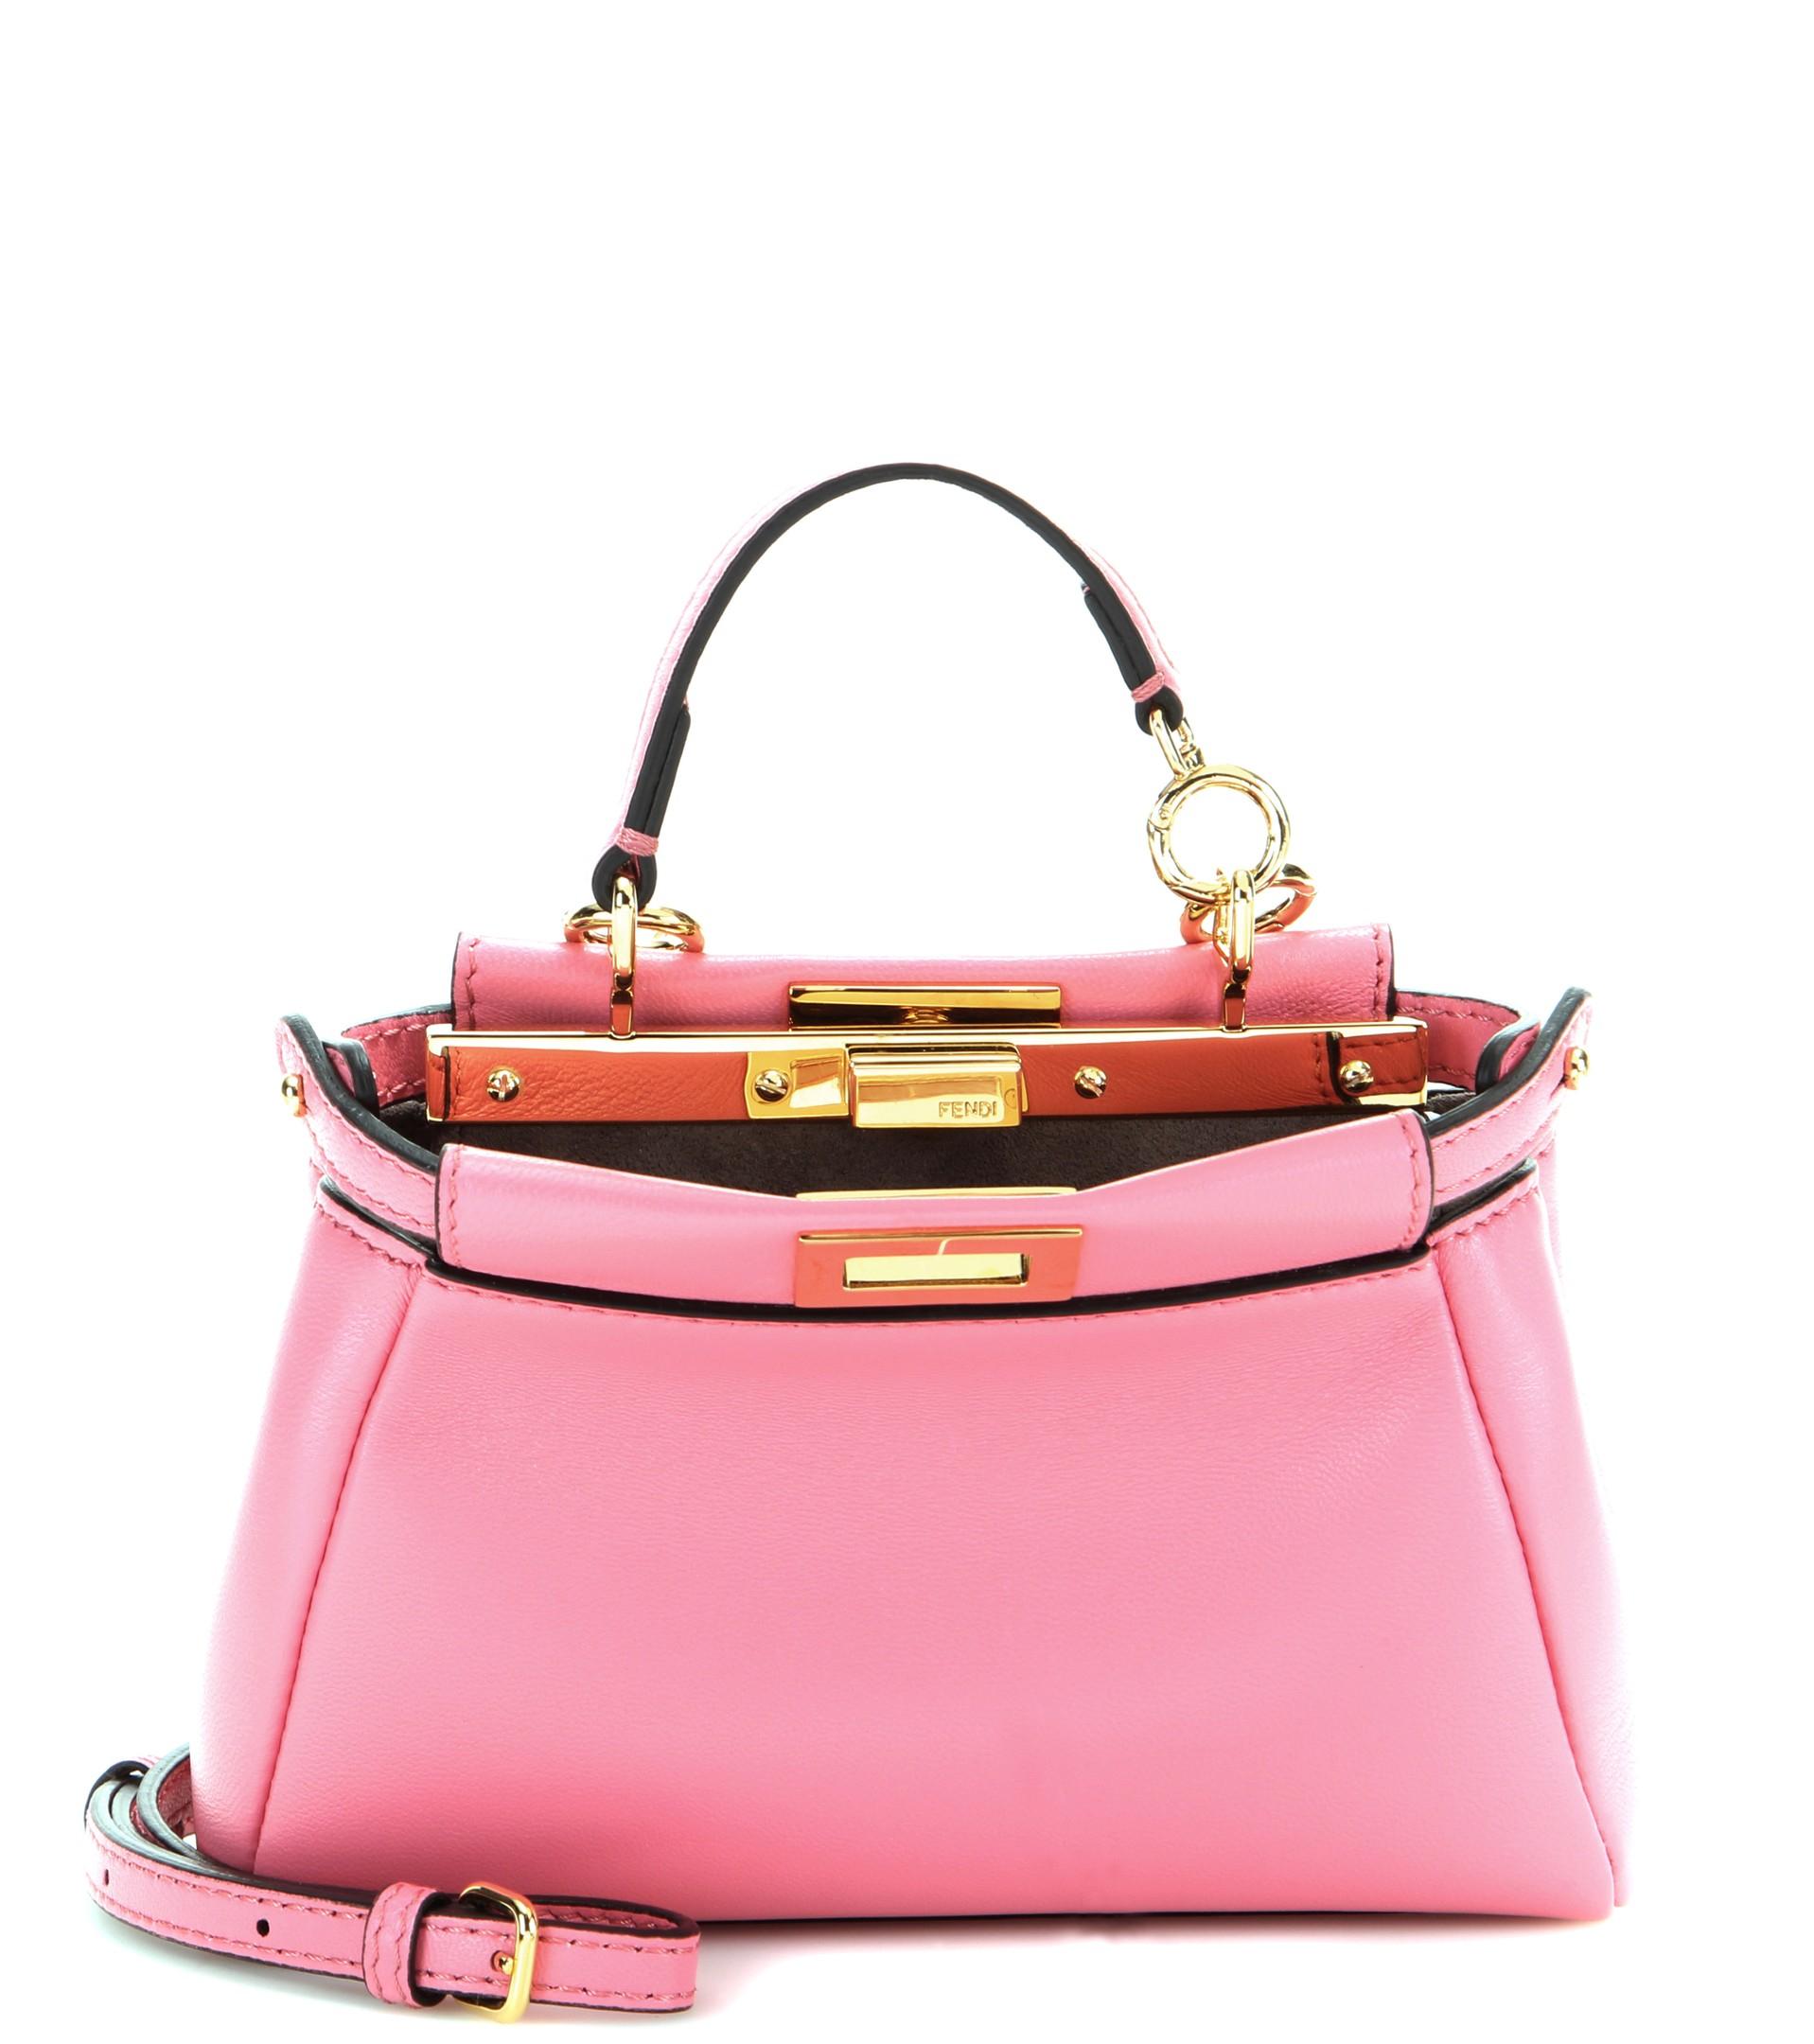 b529a814b70 Fendi Micro Peekaboo Leather Shoulder Bag in Pink - Lyst